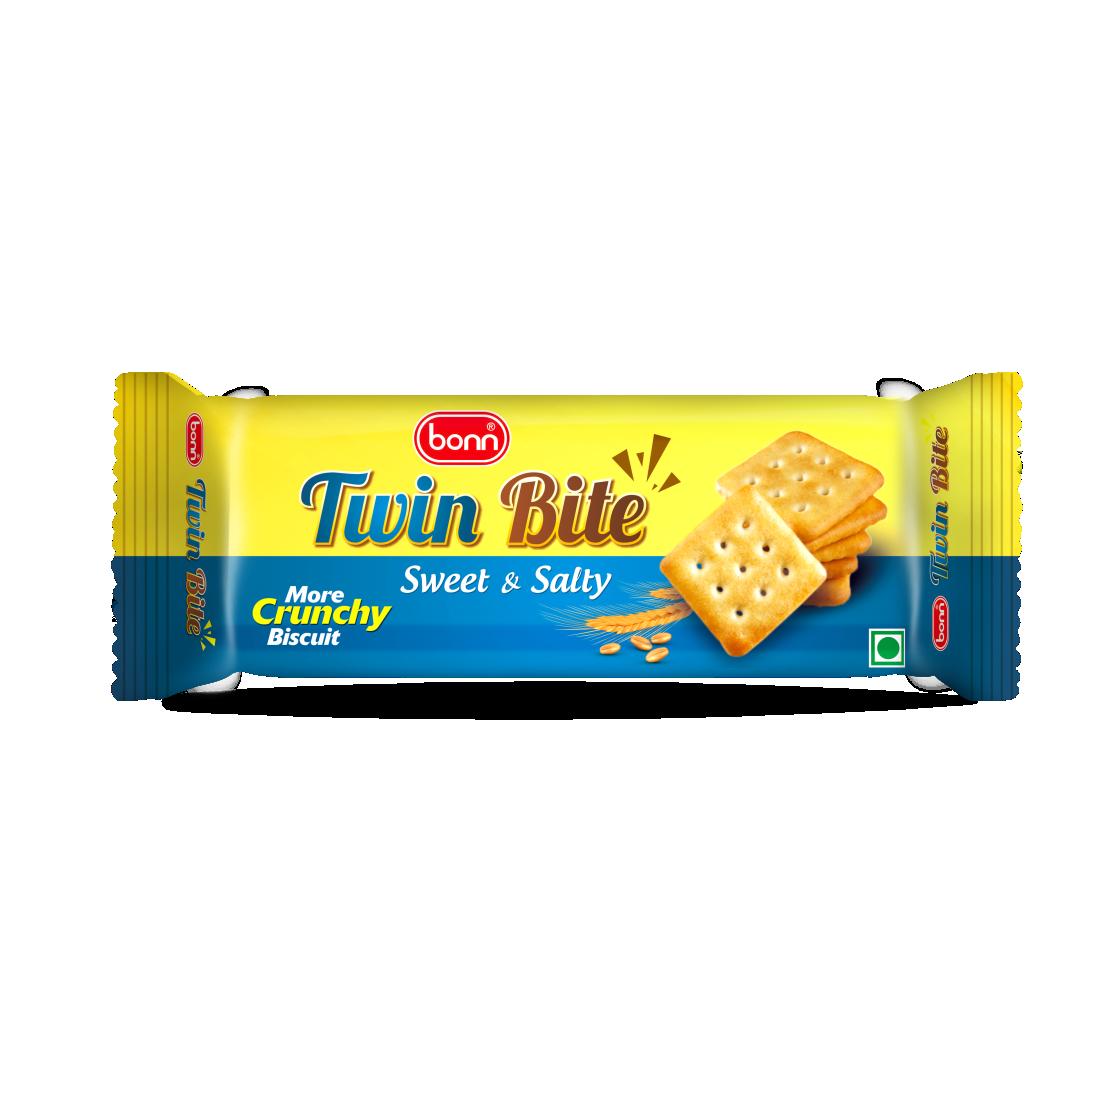 Bonn Twin Bite, Sweet & Salty Cracker Biscuits, 45 g Pack